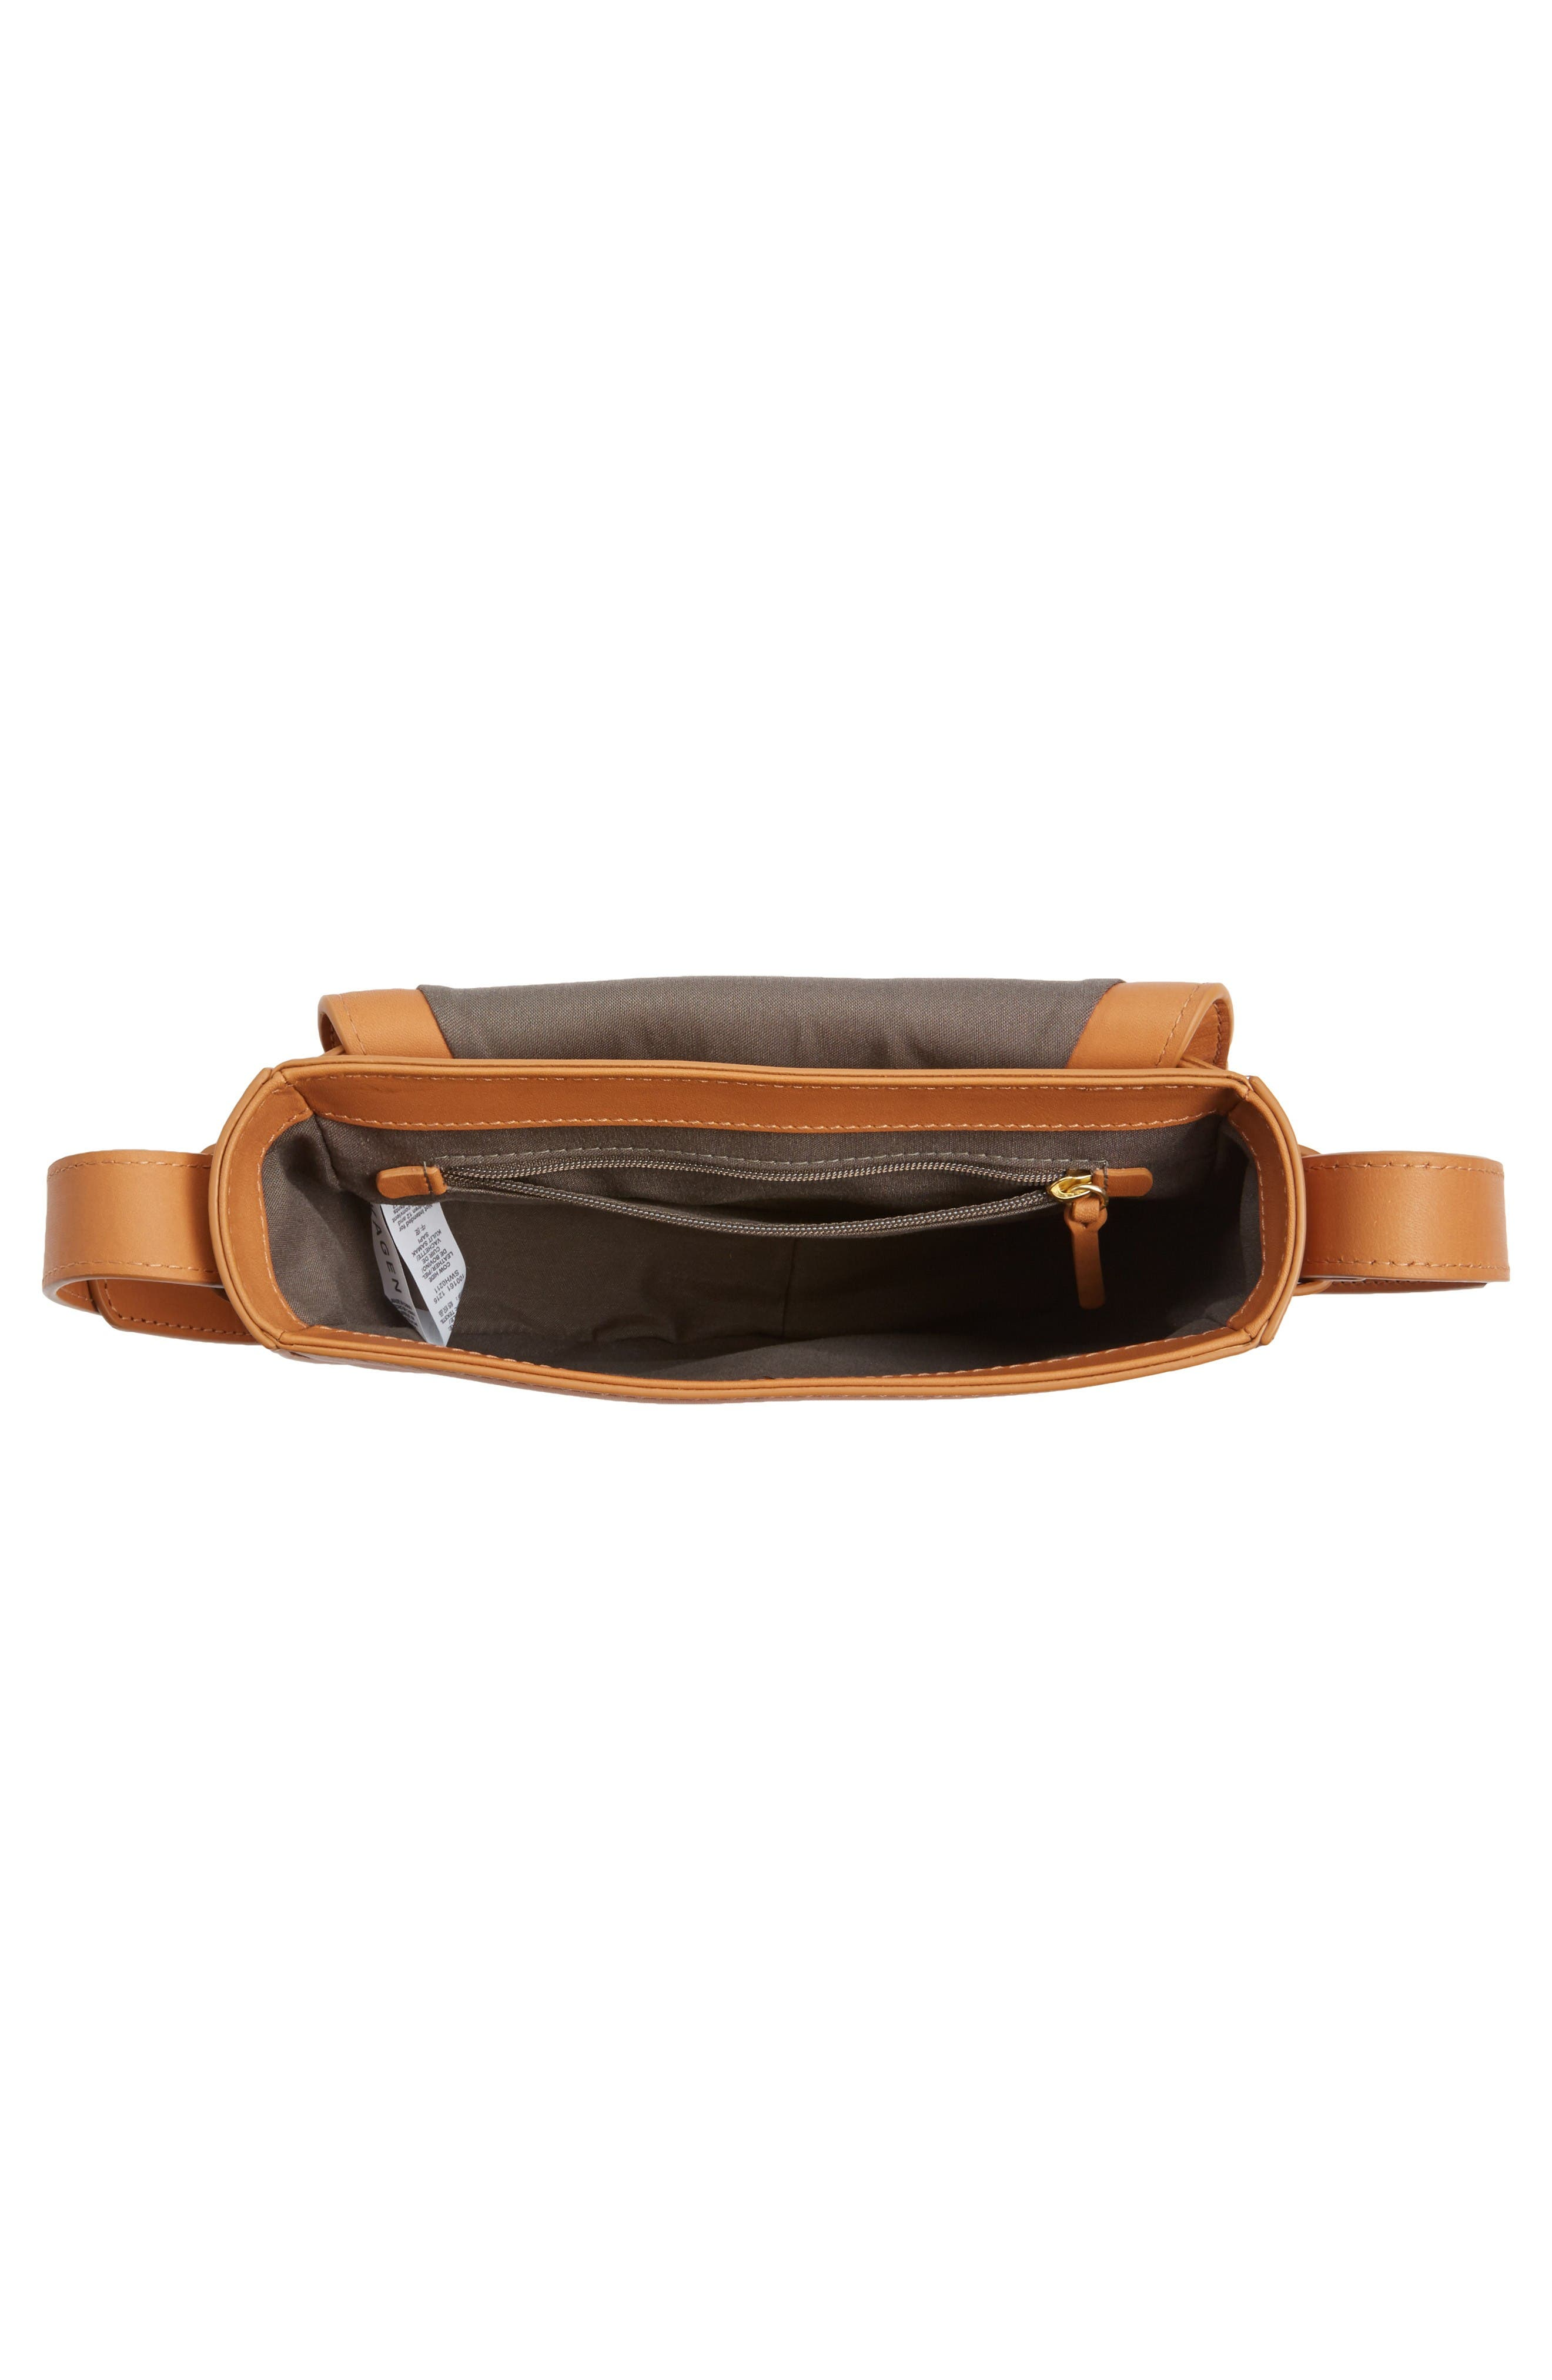 Lobelle Leather Saddle Bag,                             Alternate thumbnail 4, color,                             Tan